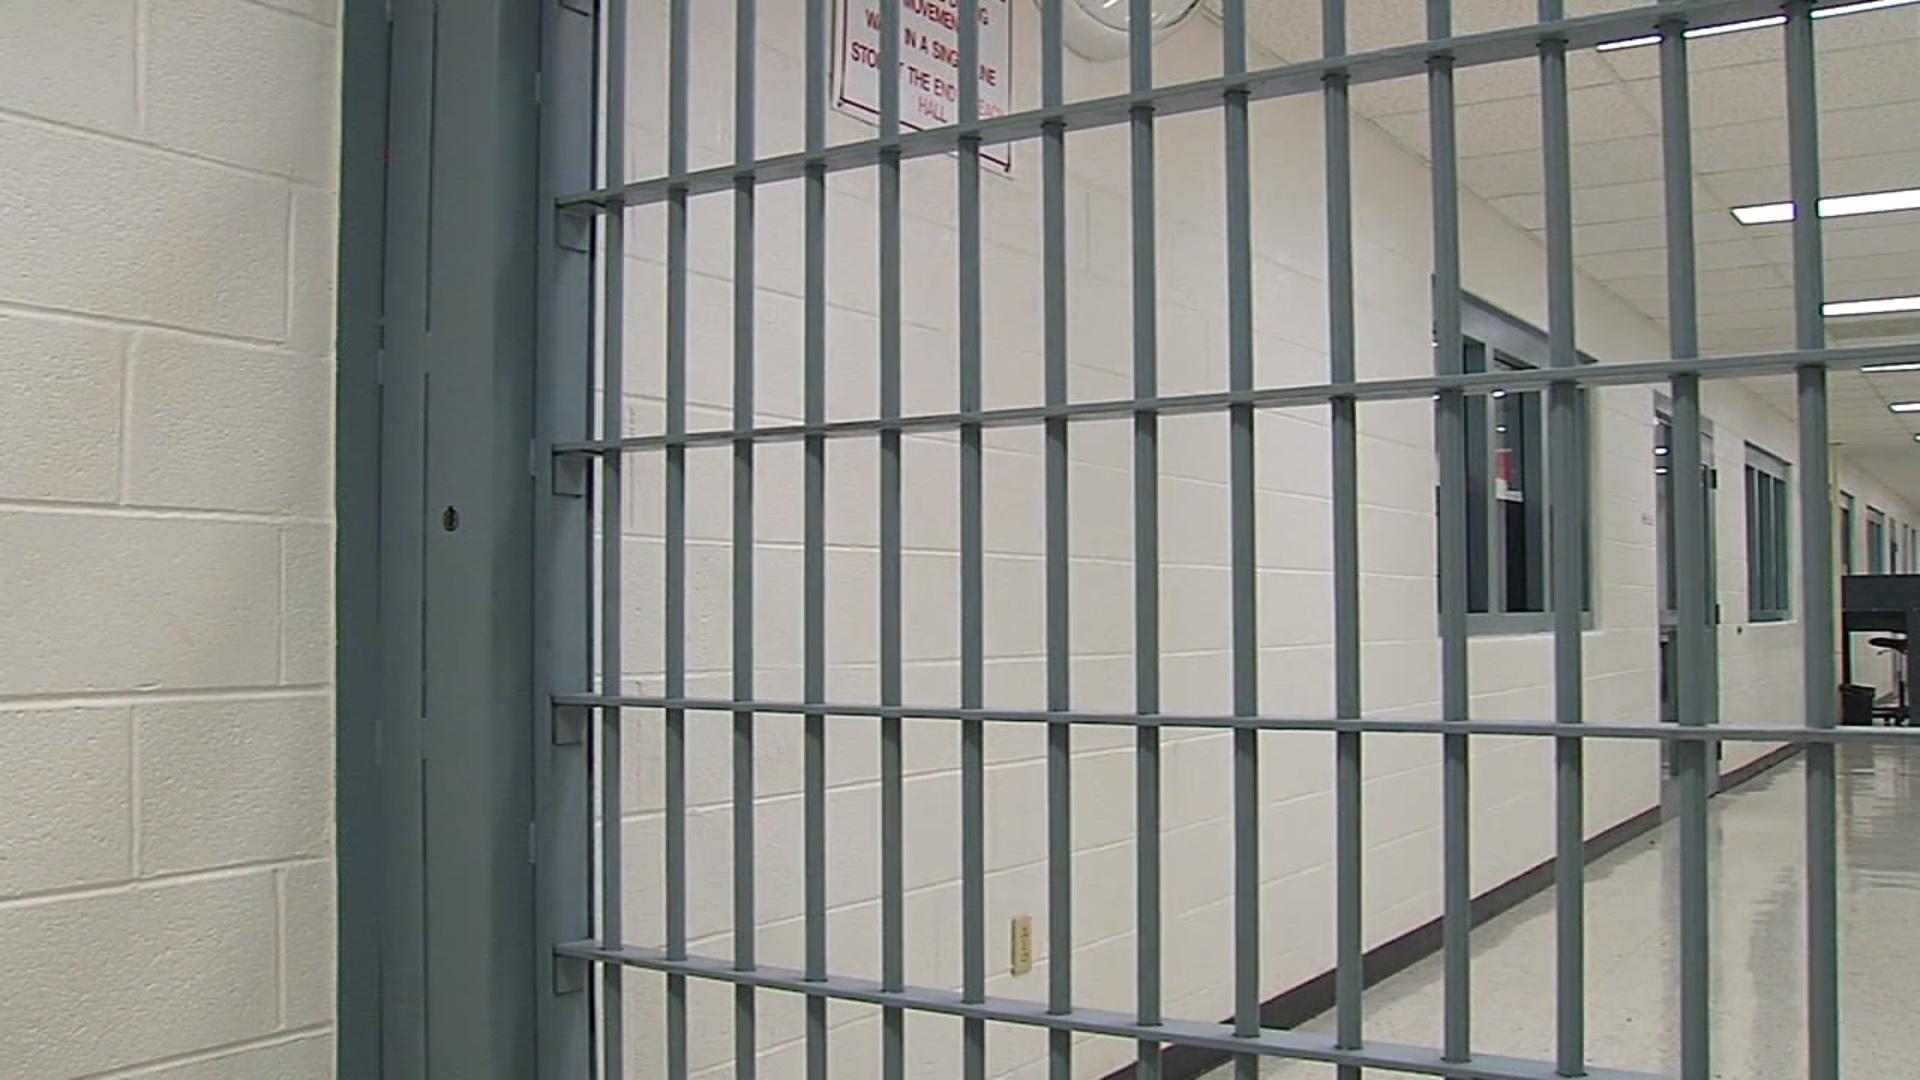 jail generic_543545